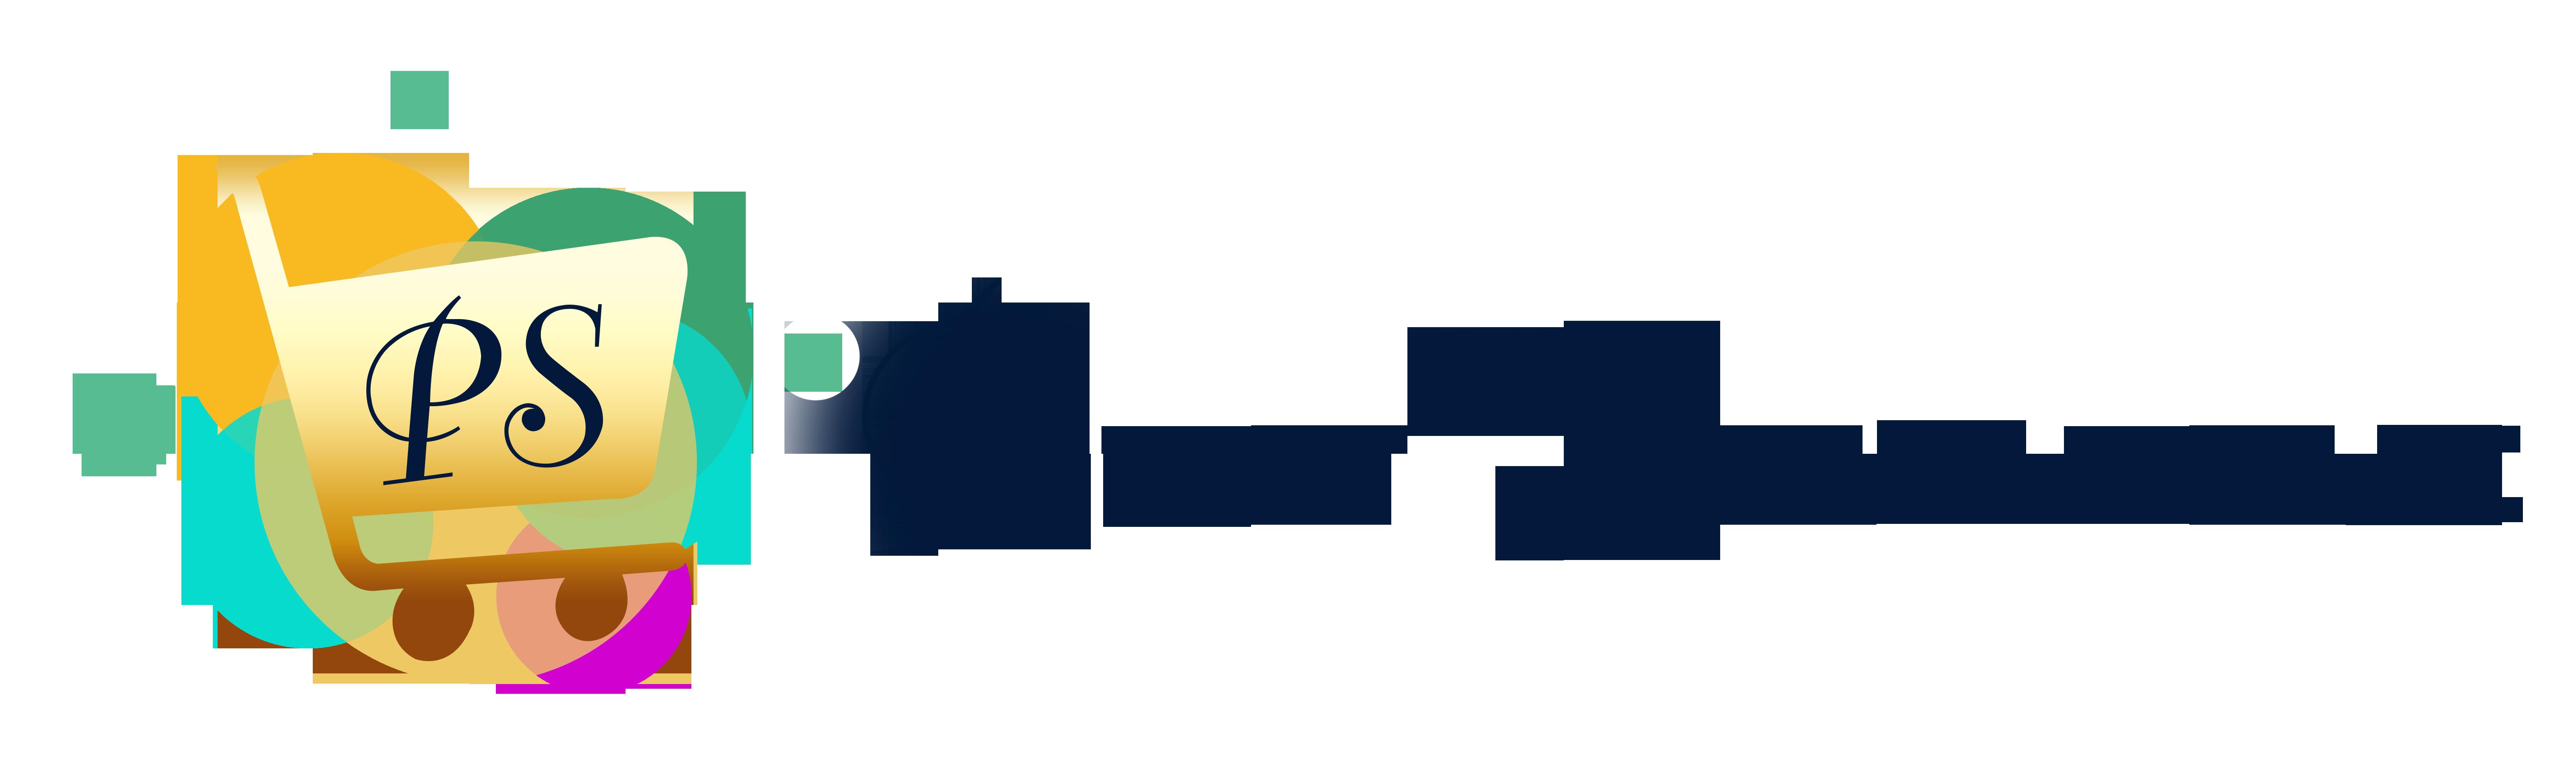 Pinoy Shopiholic